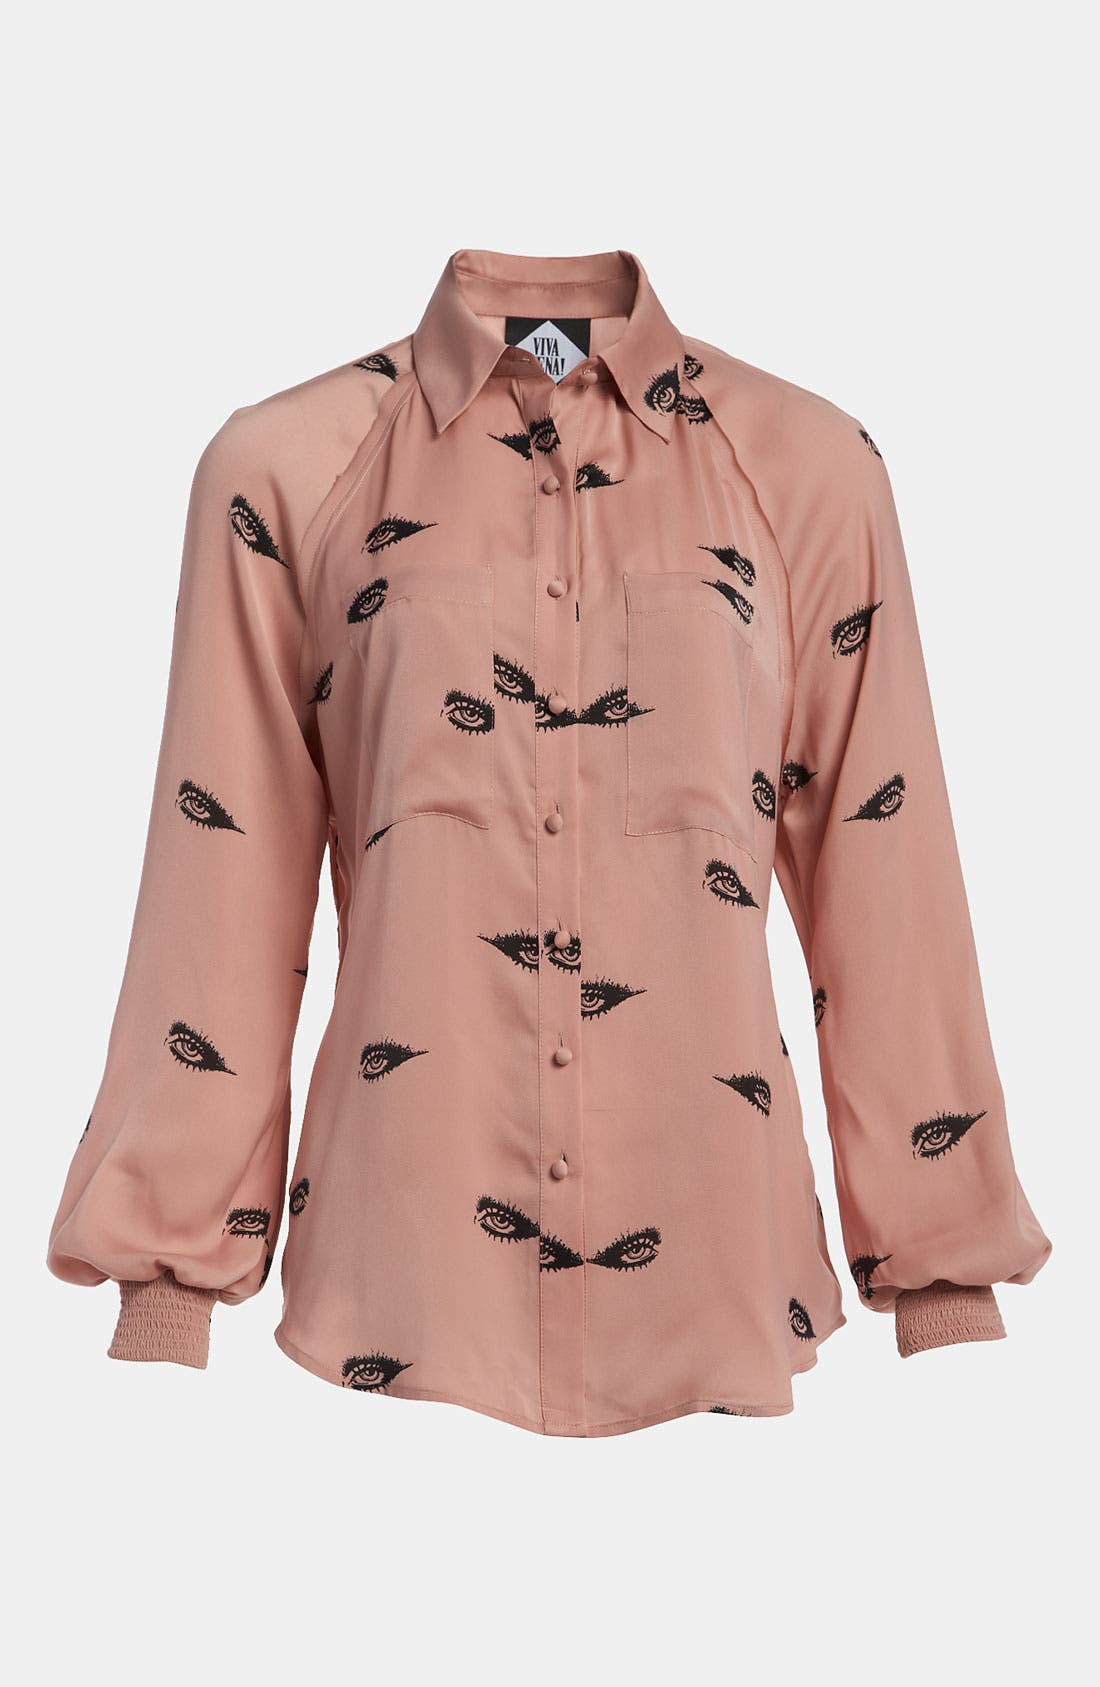 Alternate Image 1 Selected - Viva Vena! Bishop Sleeve Shirt